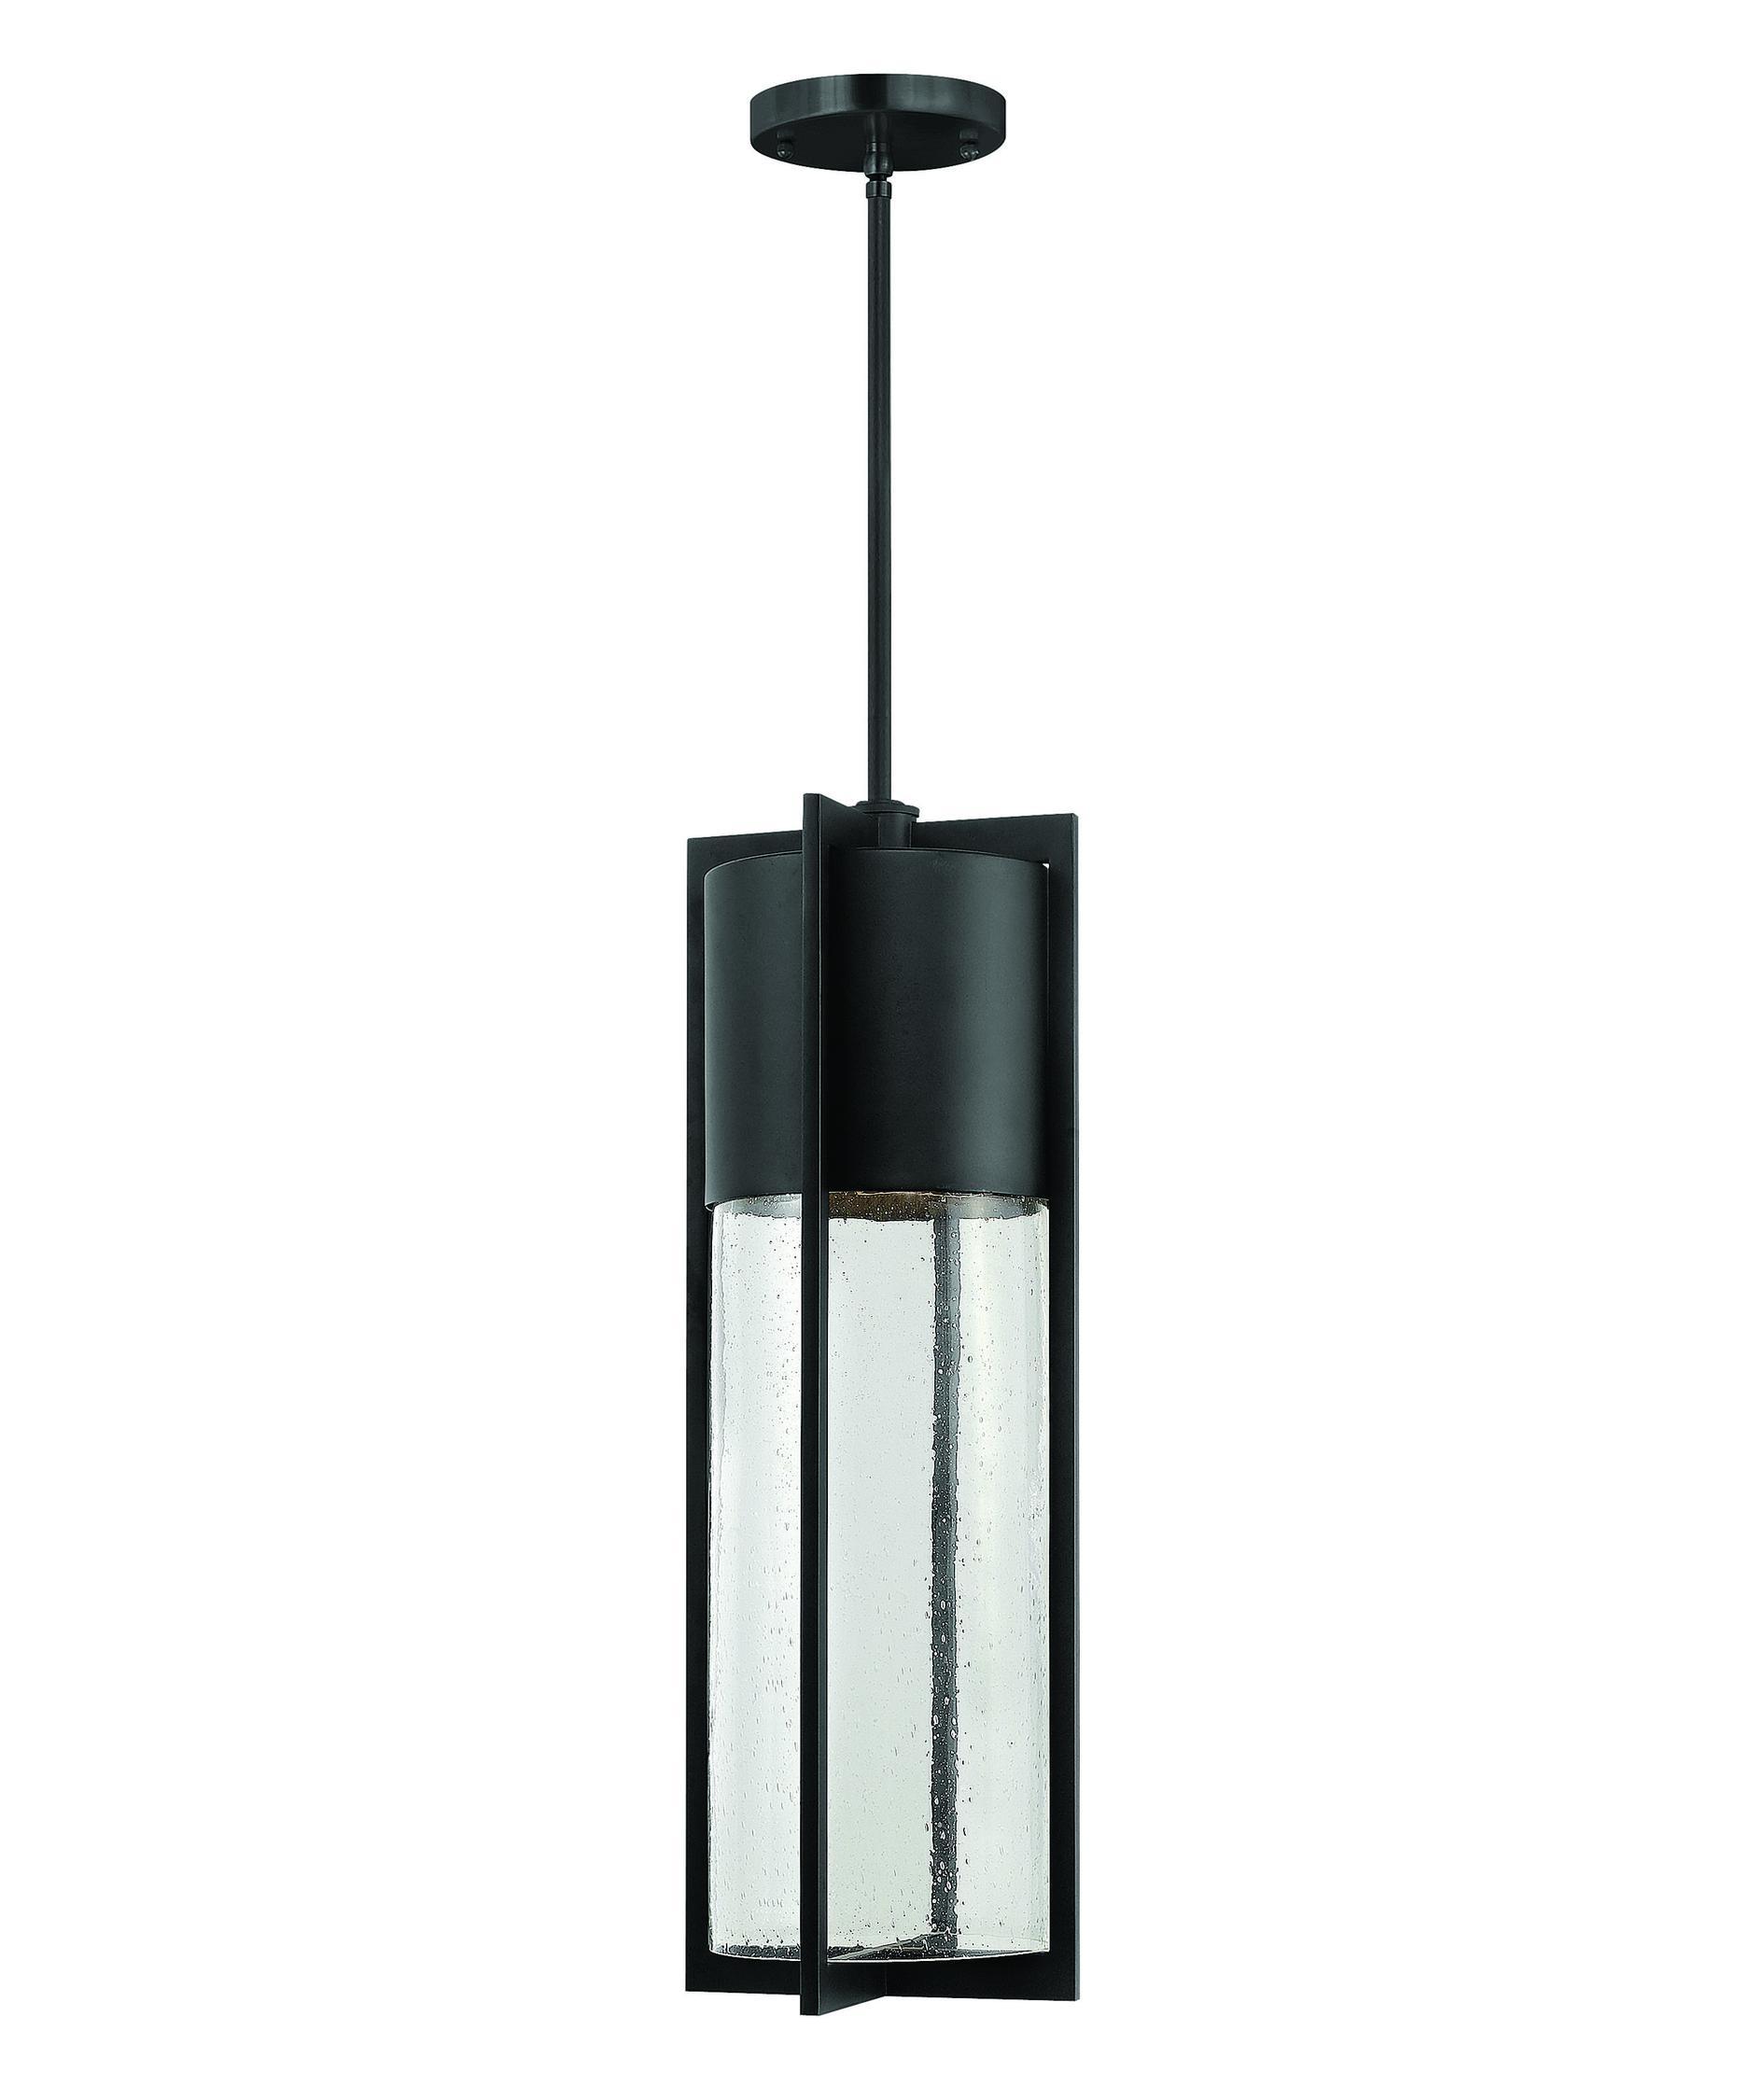 Hinkley Lighting 1328 Shelter 8 Inch Wide 1 Light Outdoor Hanging Regarding Modern Latern Hinkley Lighting (View 10 of 15)